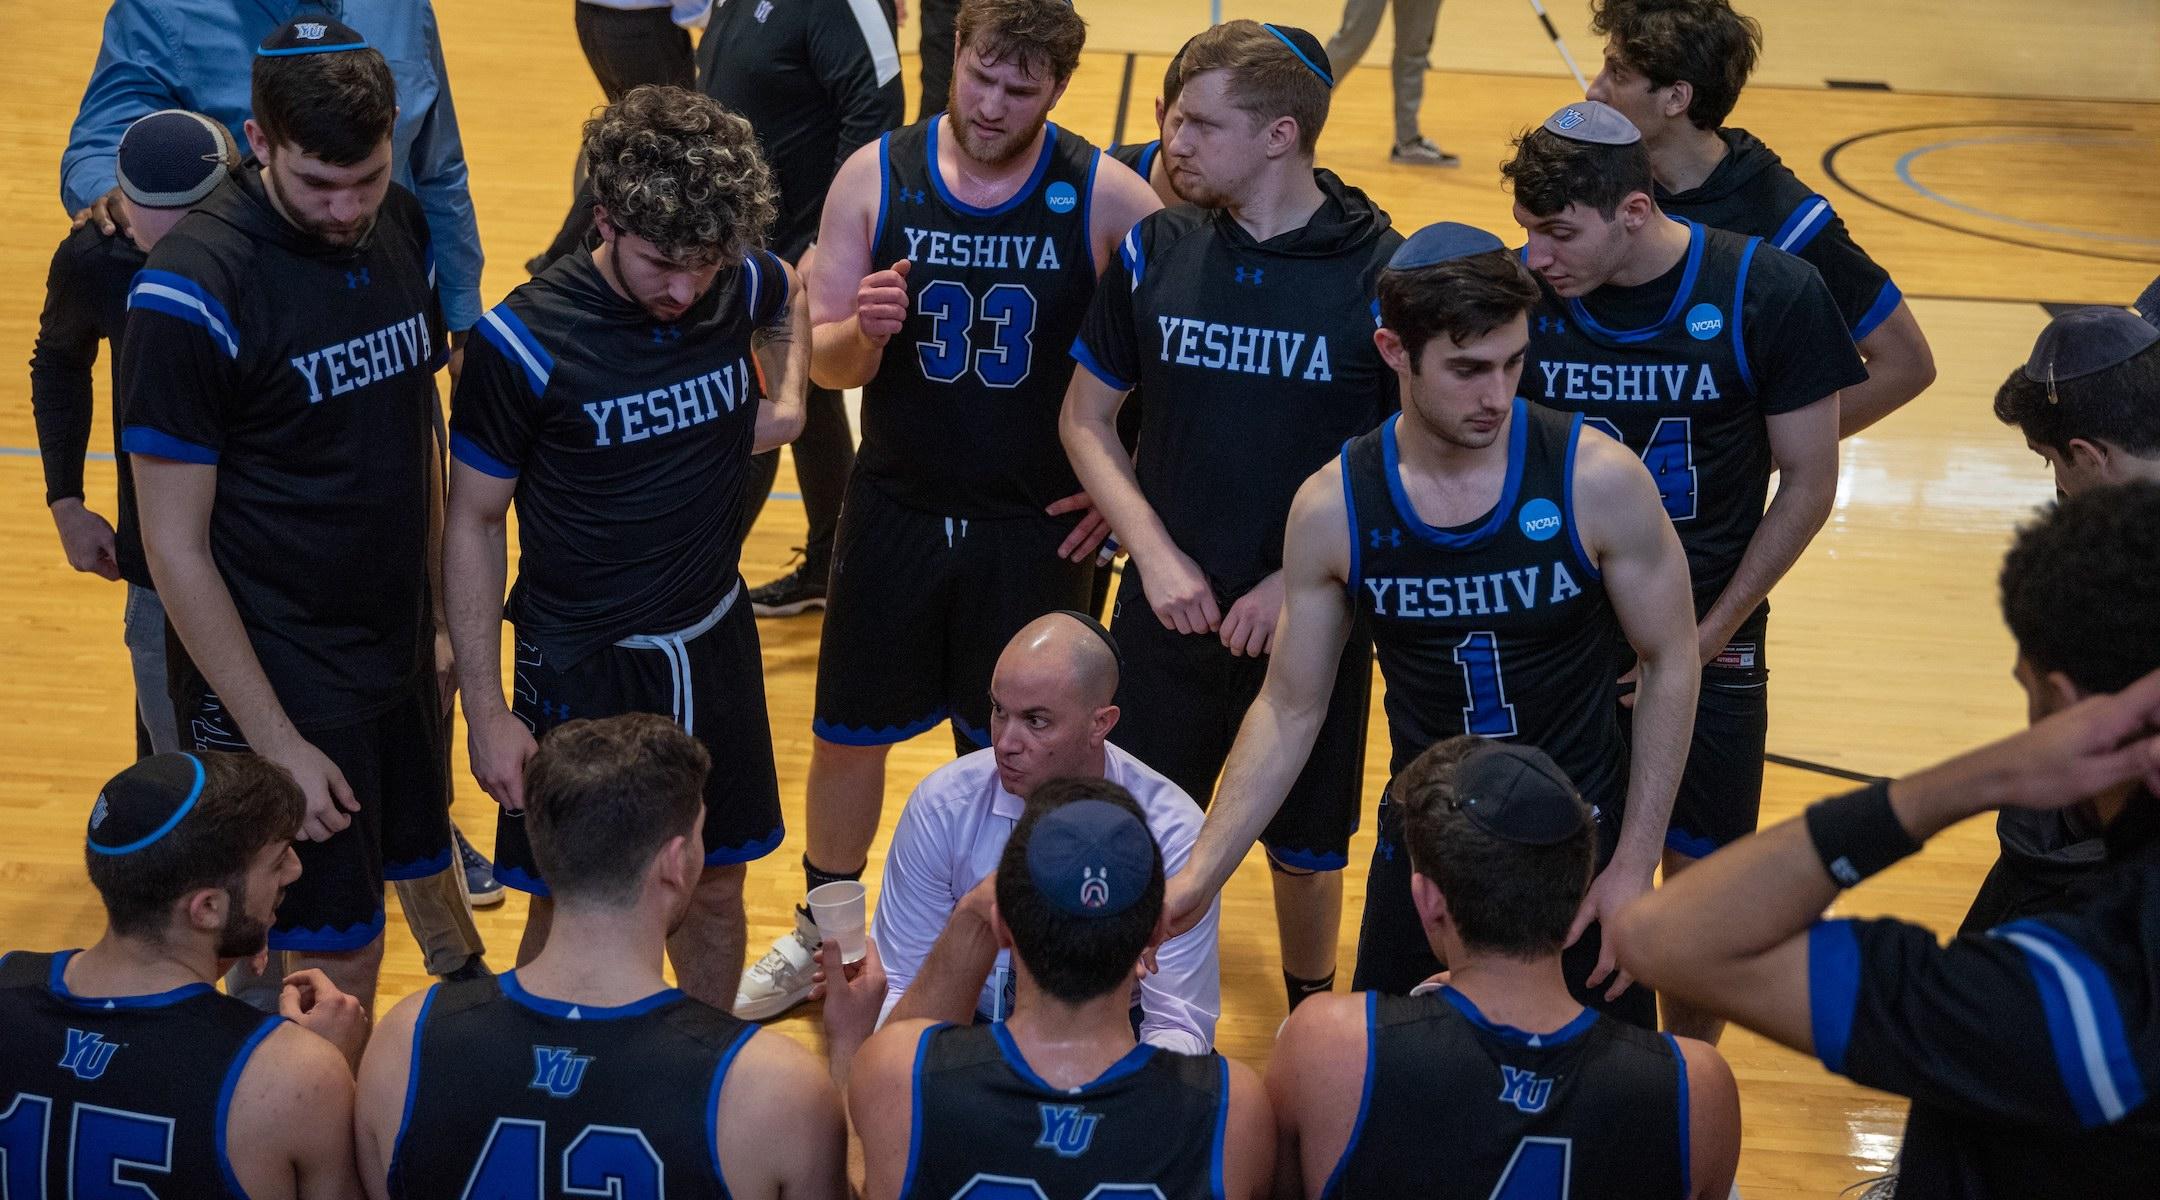 Yeshiva University men's basketball is on a 35-game winning streak